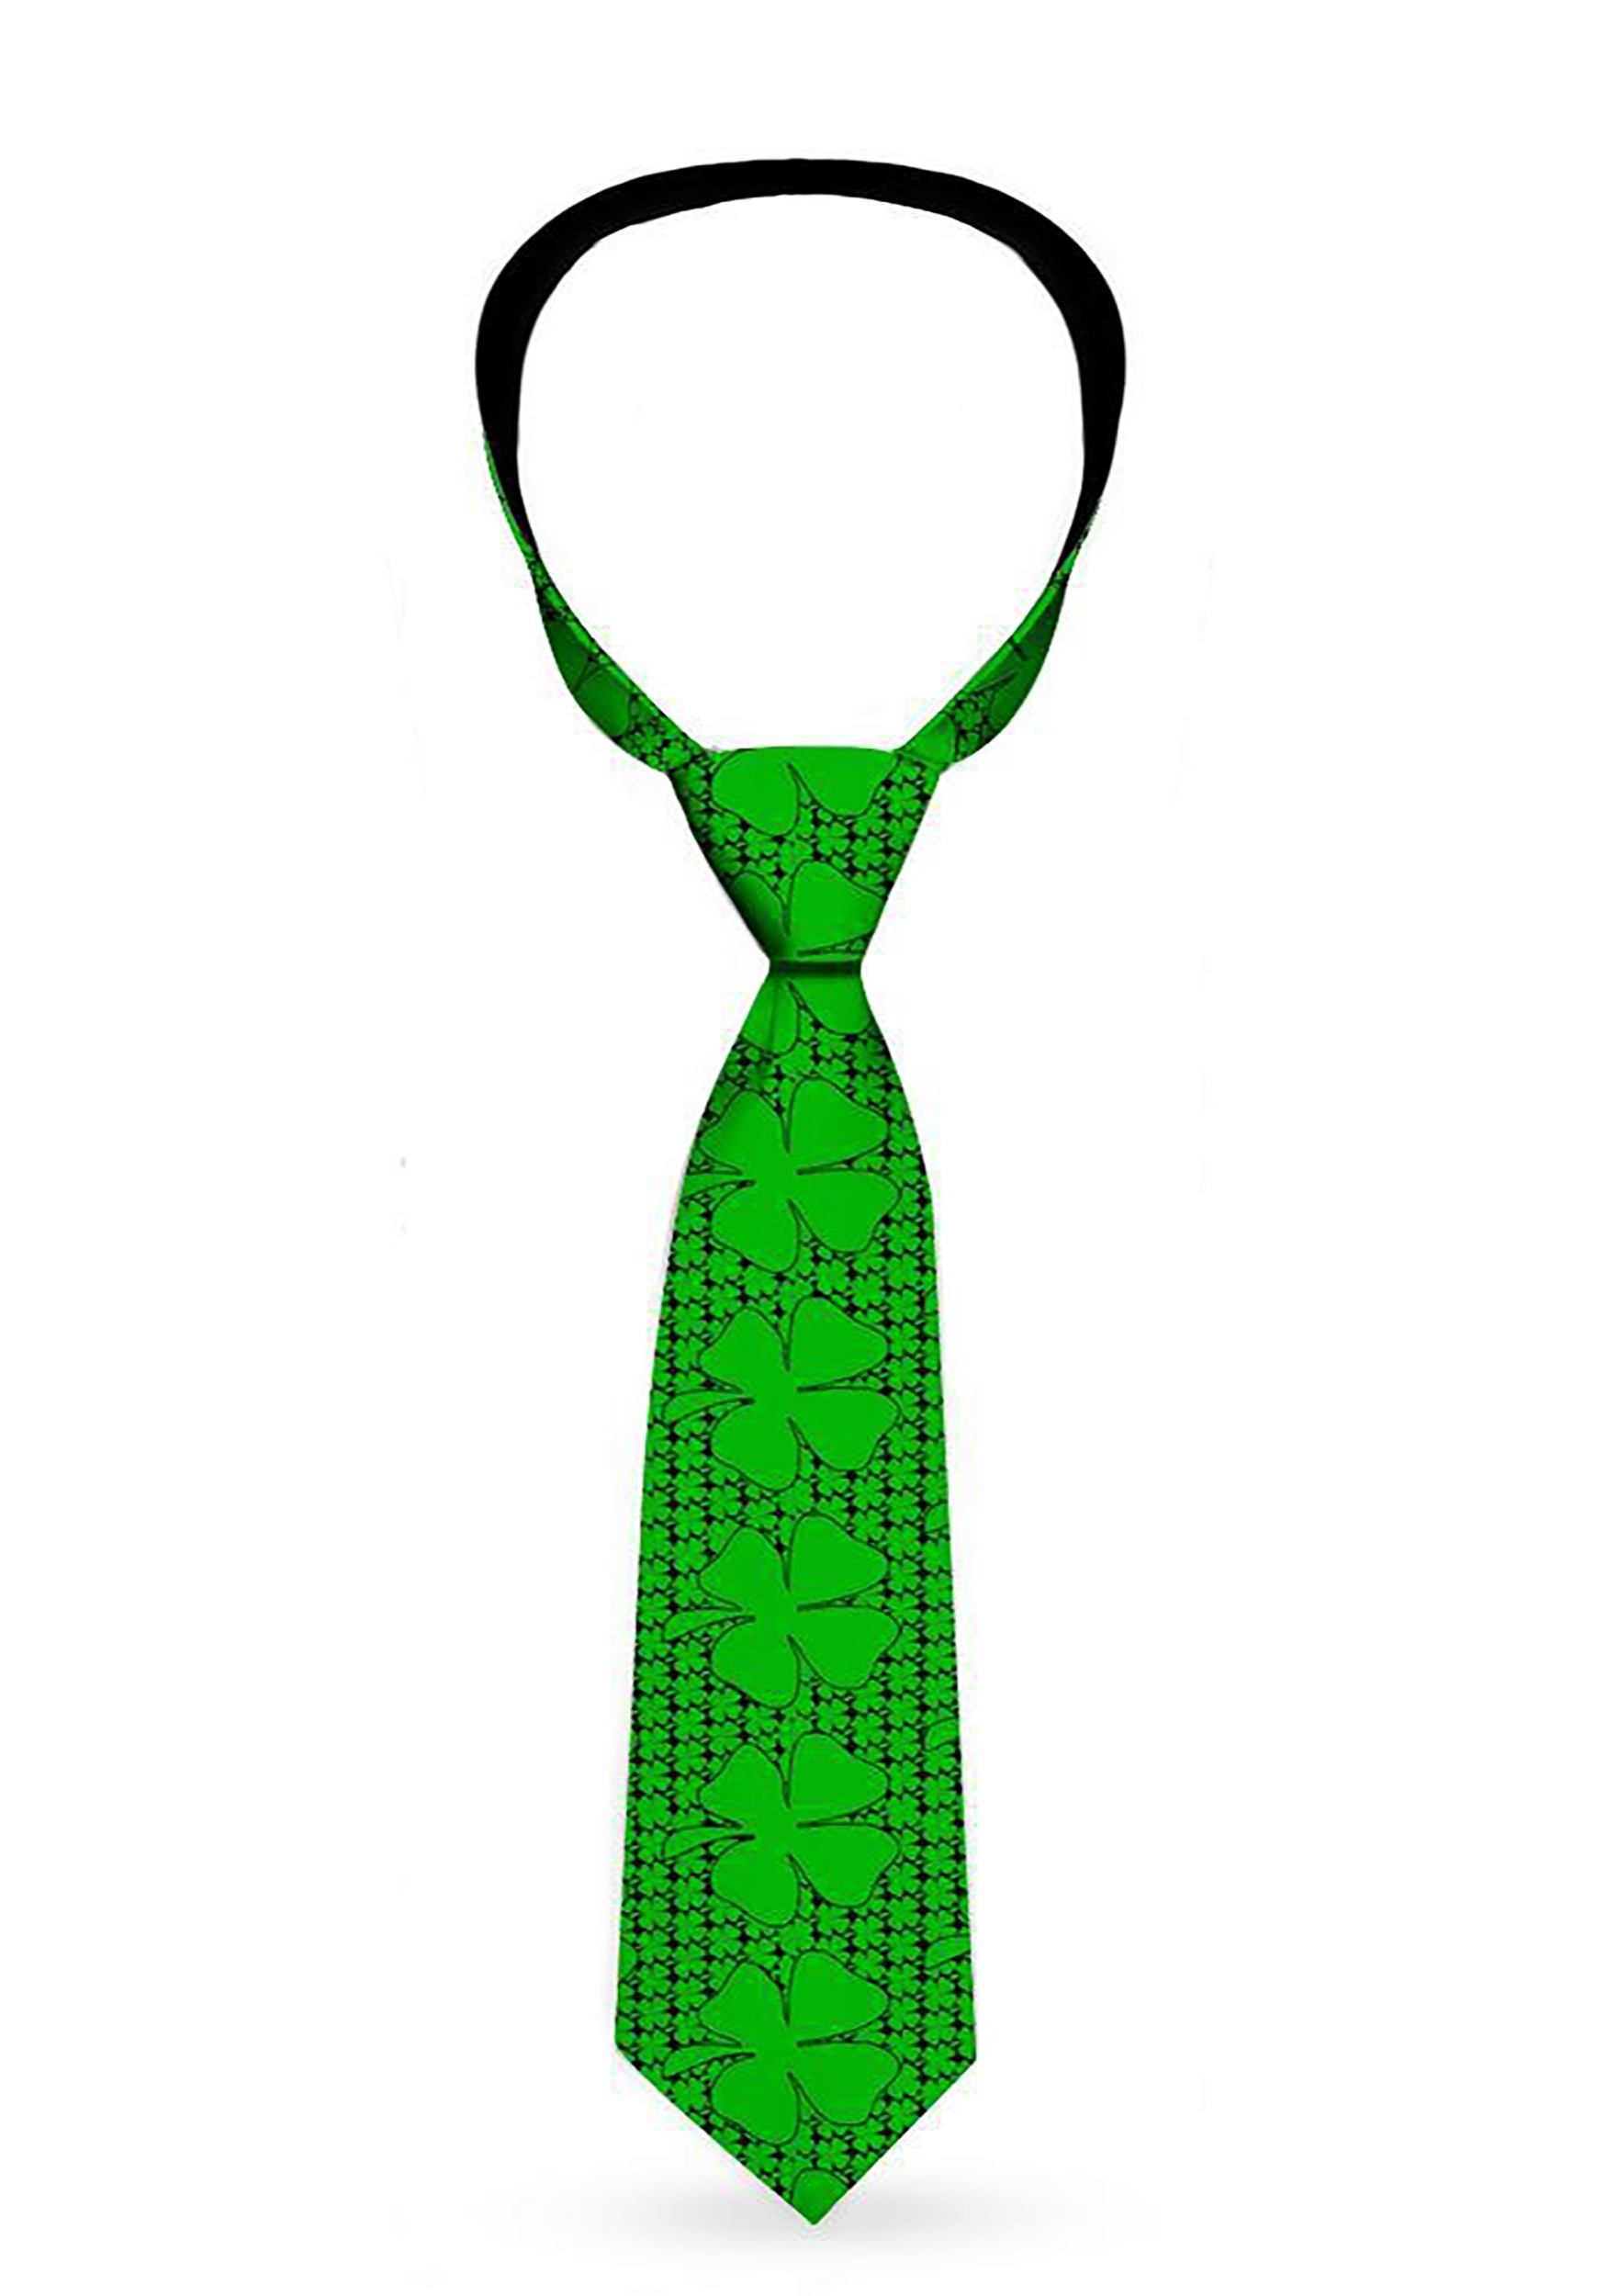 Saint_Patricks_Day_Lucky_Clovers_Green_Necktie